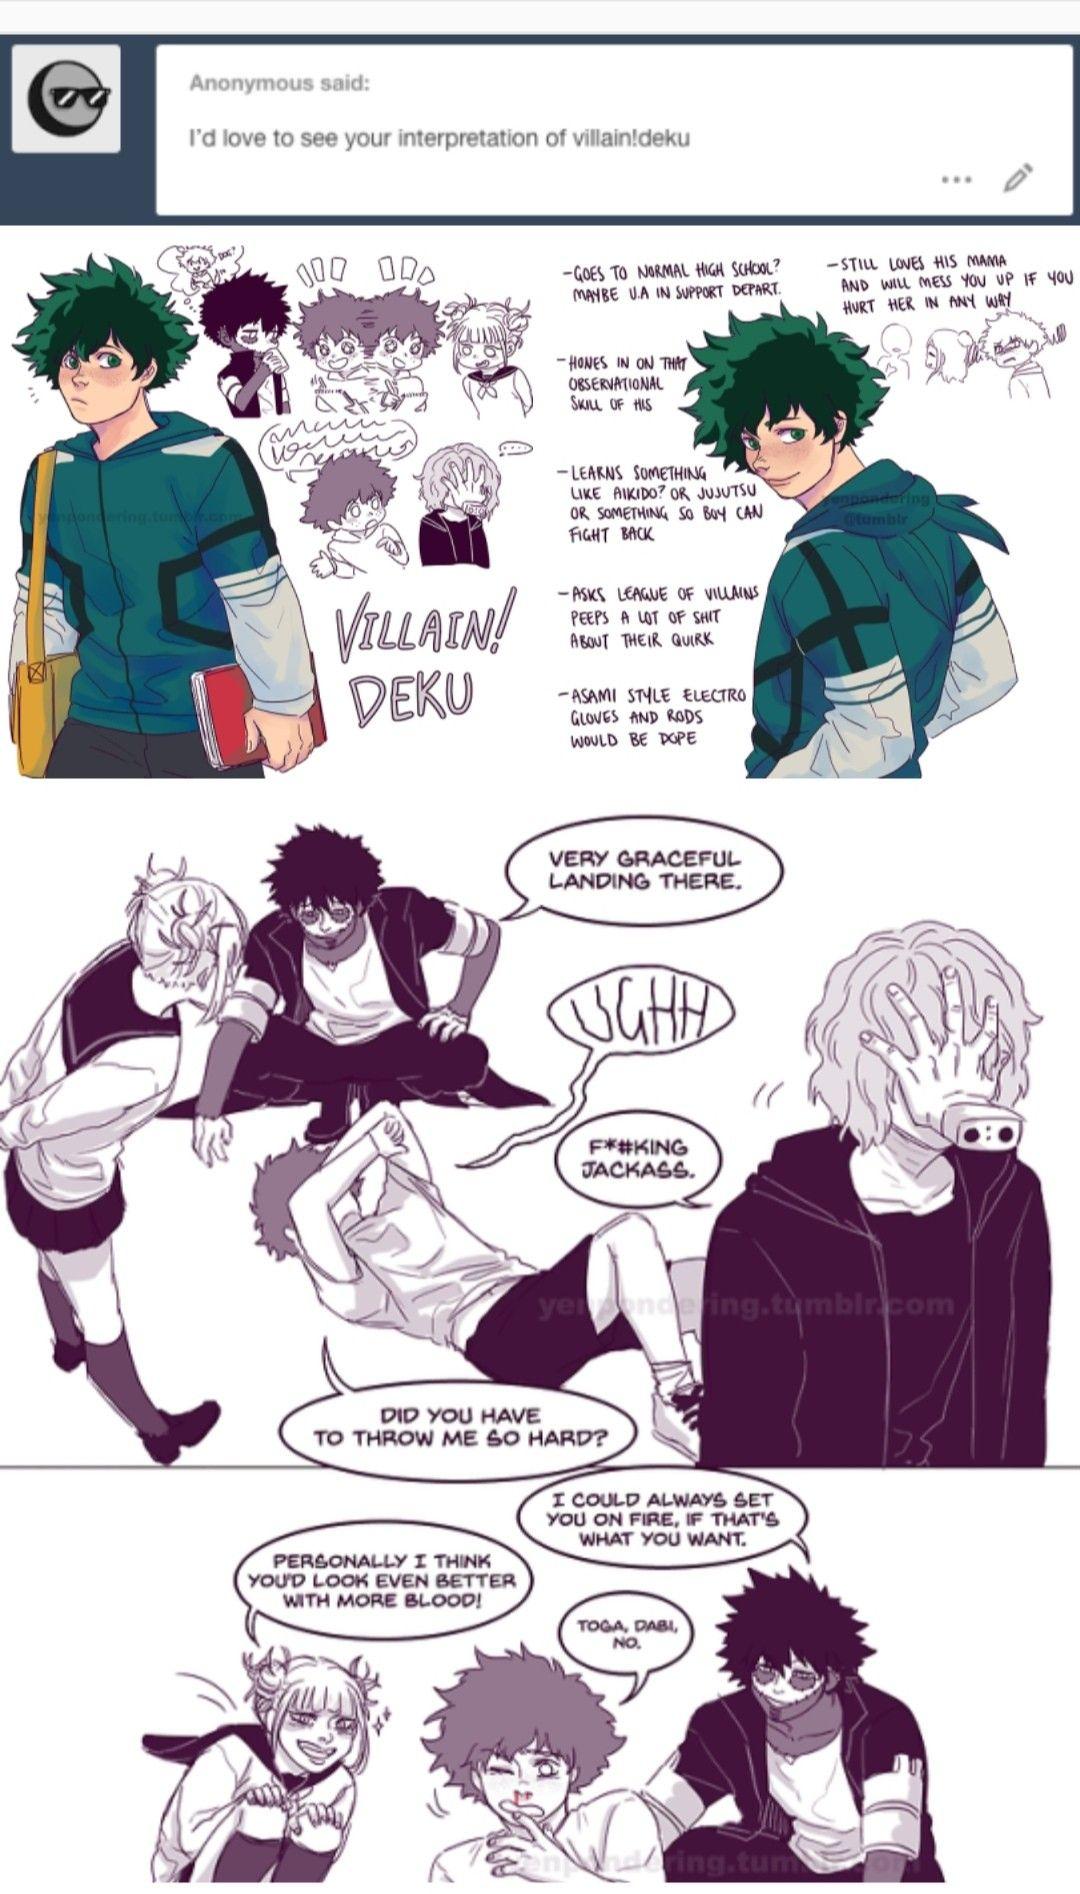 Pin By Meh Rick On Boku No Hero Academia My Hero Academia Memes Villain Deku My Hero